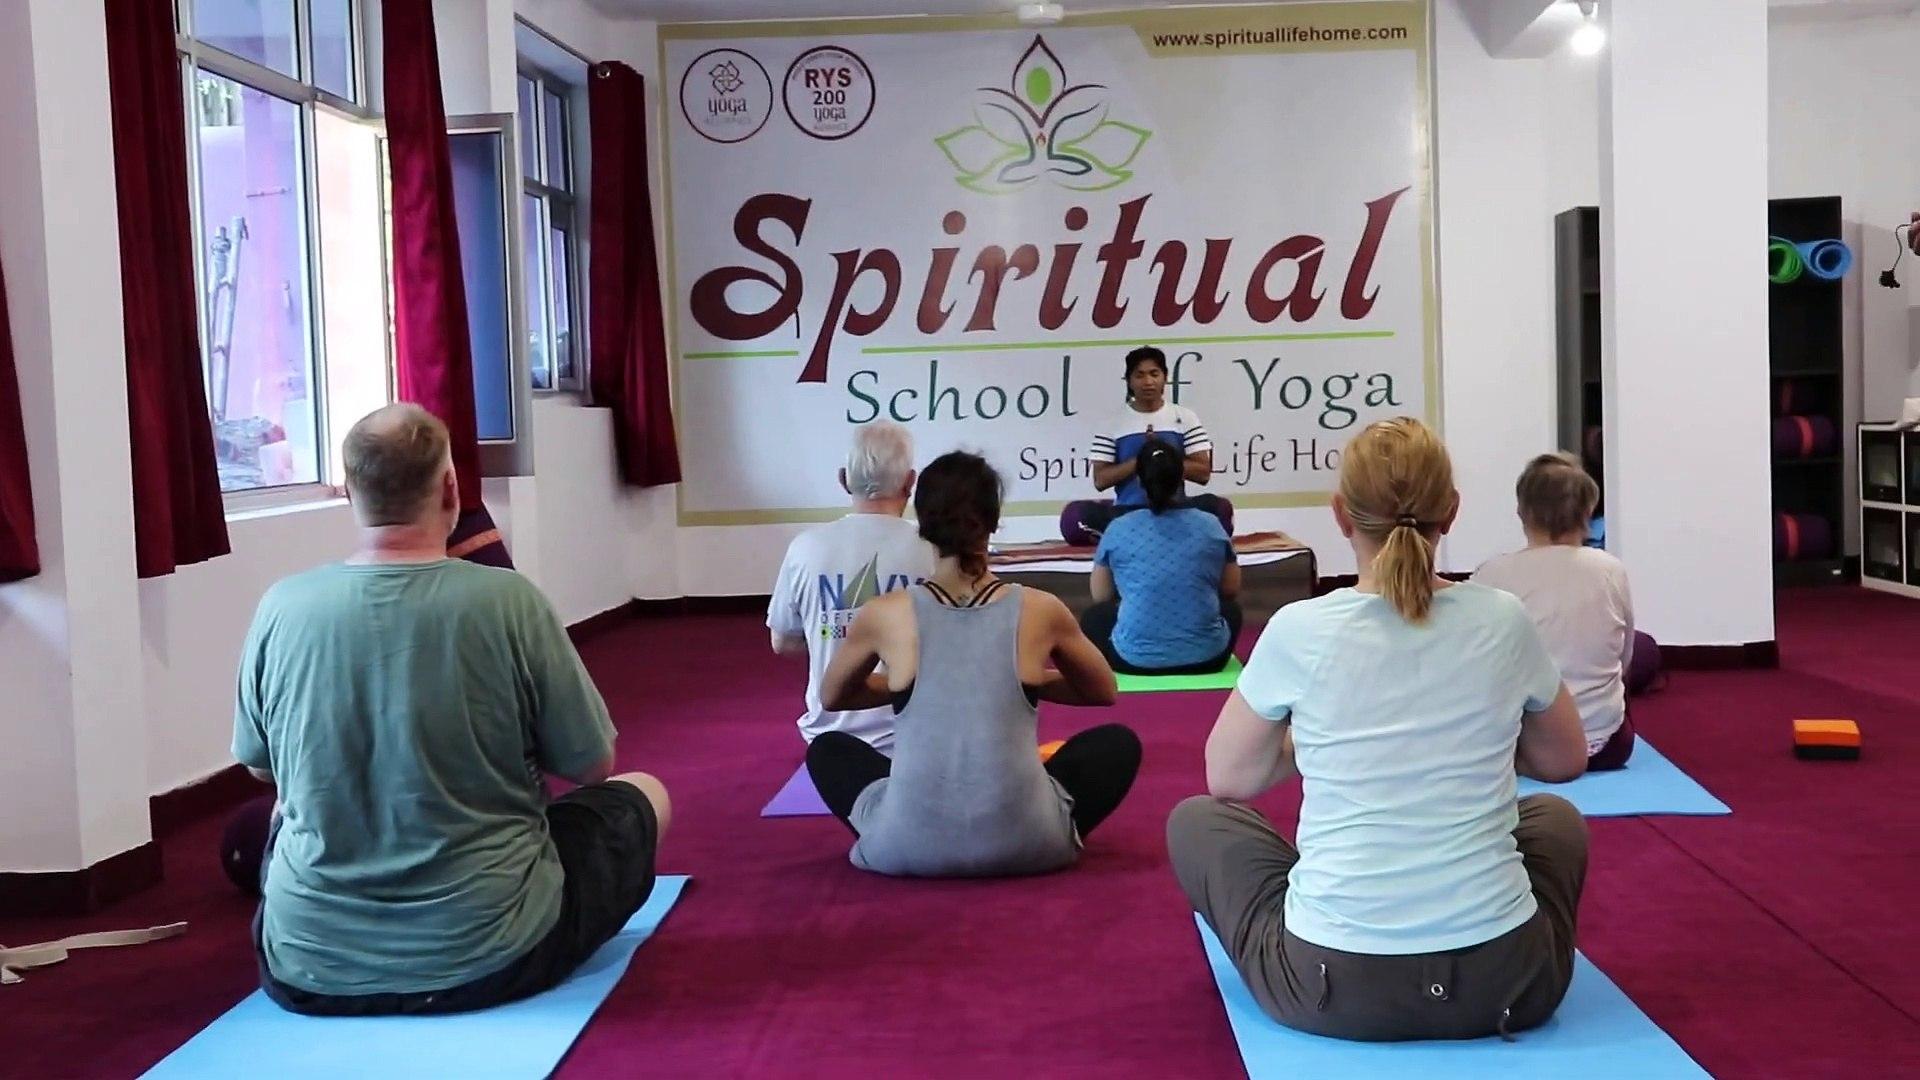 Client Yoga Session at Spiritual School of Yoga, Rishikesh